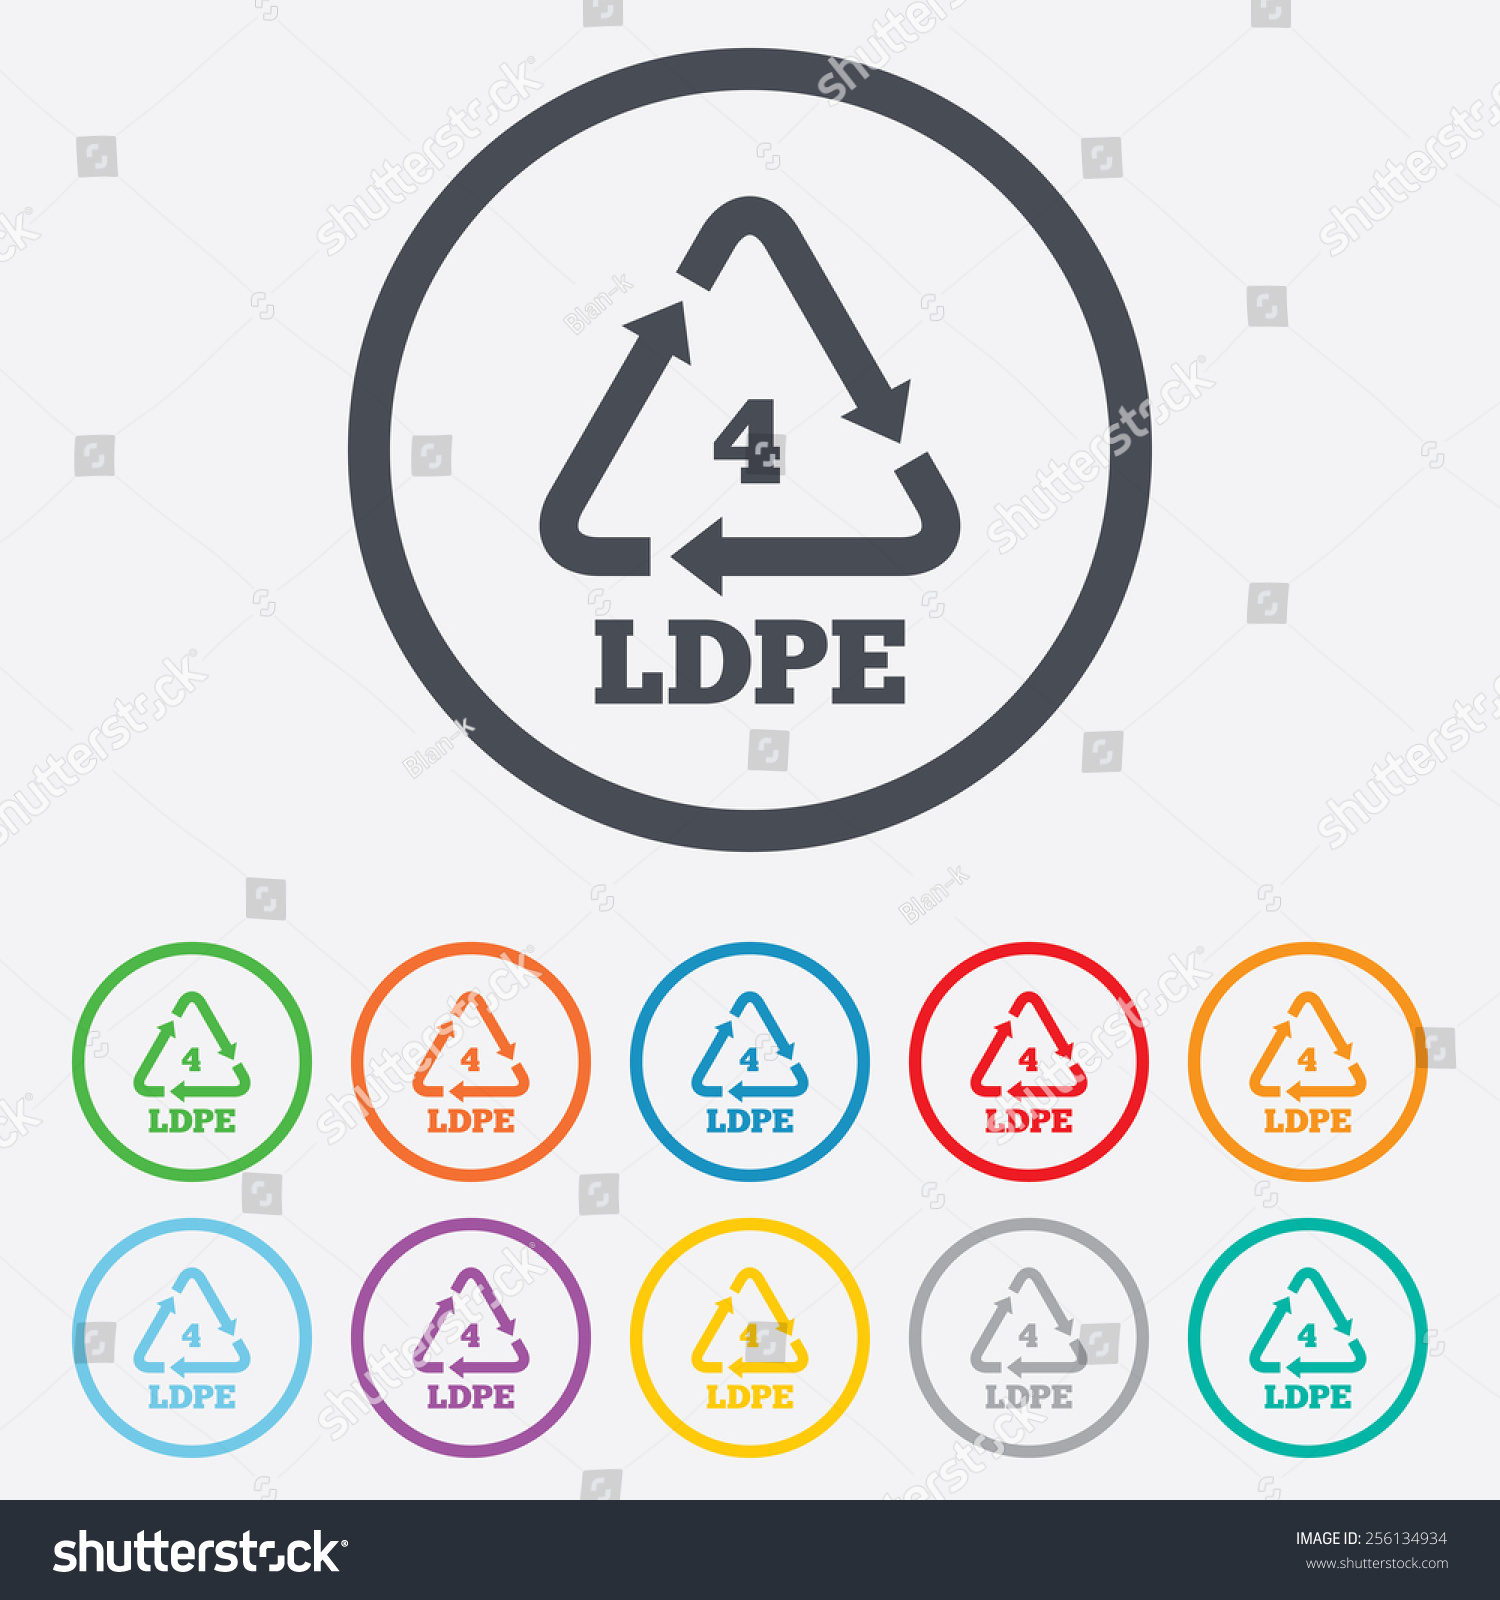 Ldpe 4 icon lowdensity polyethylene sign stock vector 256134934 ld pe 4 icon low density polyethylene sign recycling symbol round biocorpaavc Choice Image